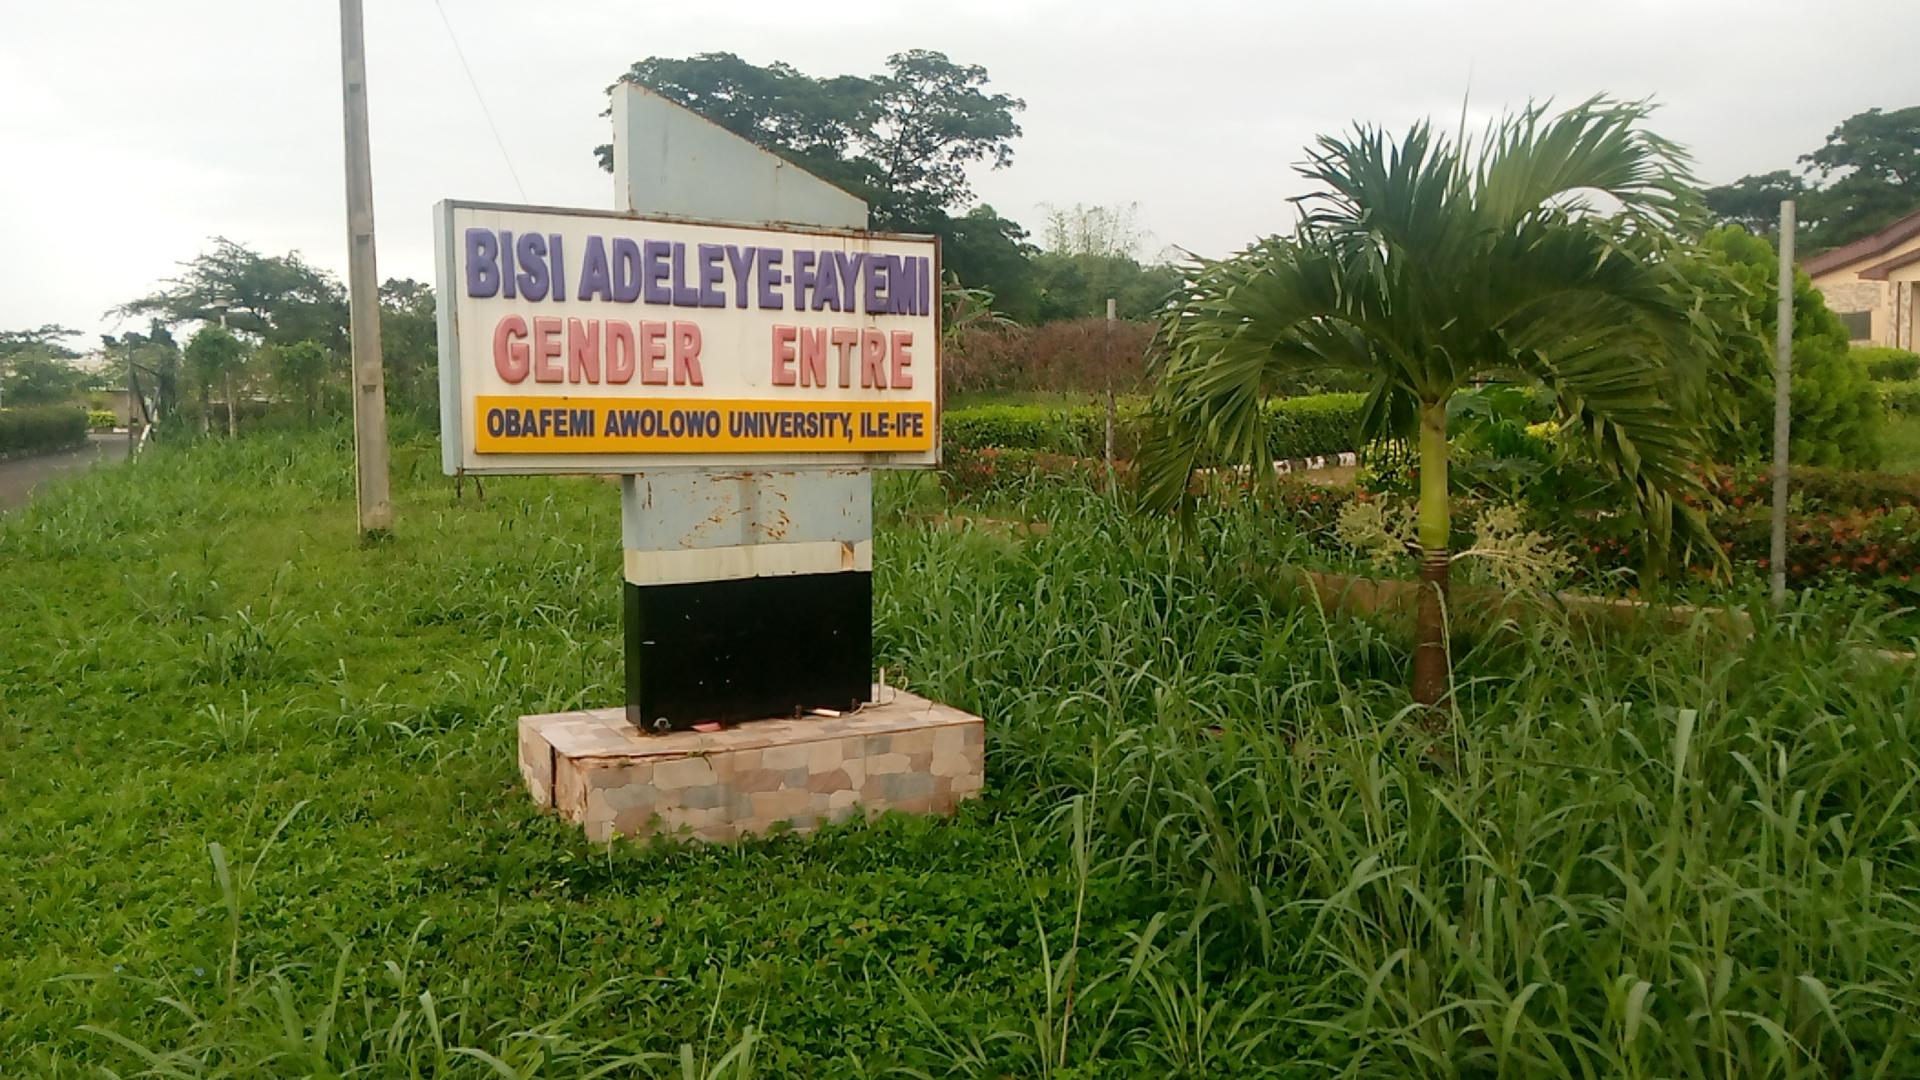 OAU gender centre